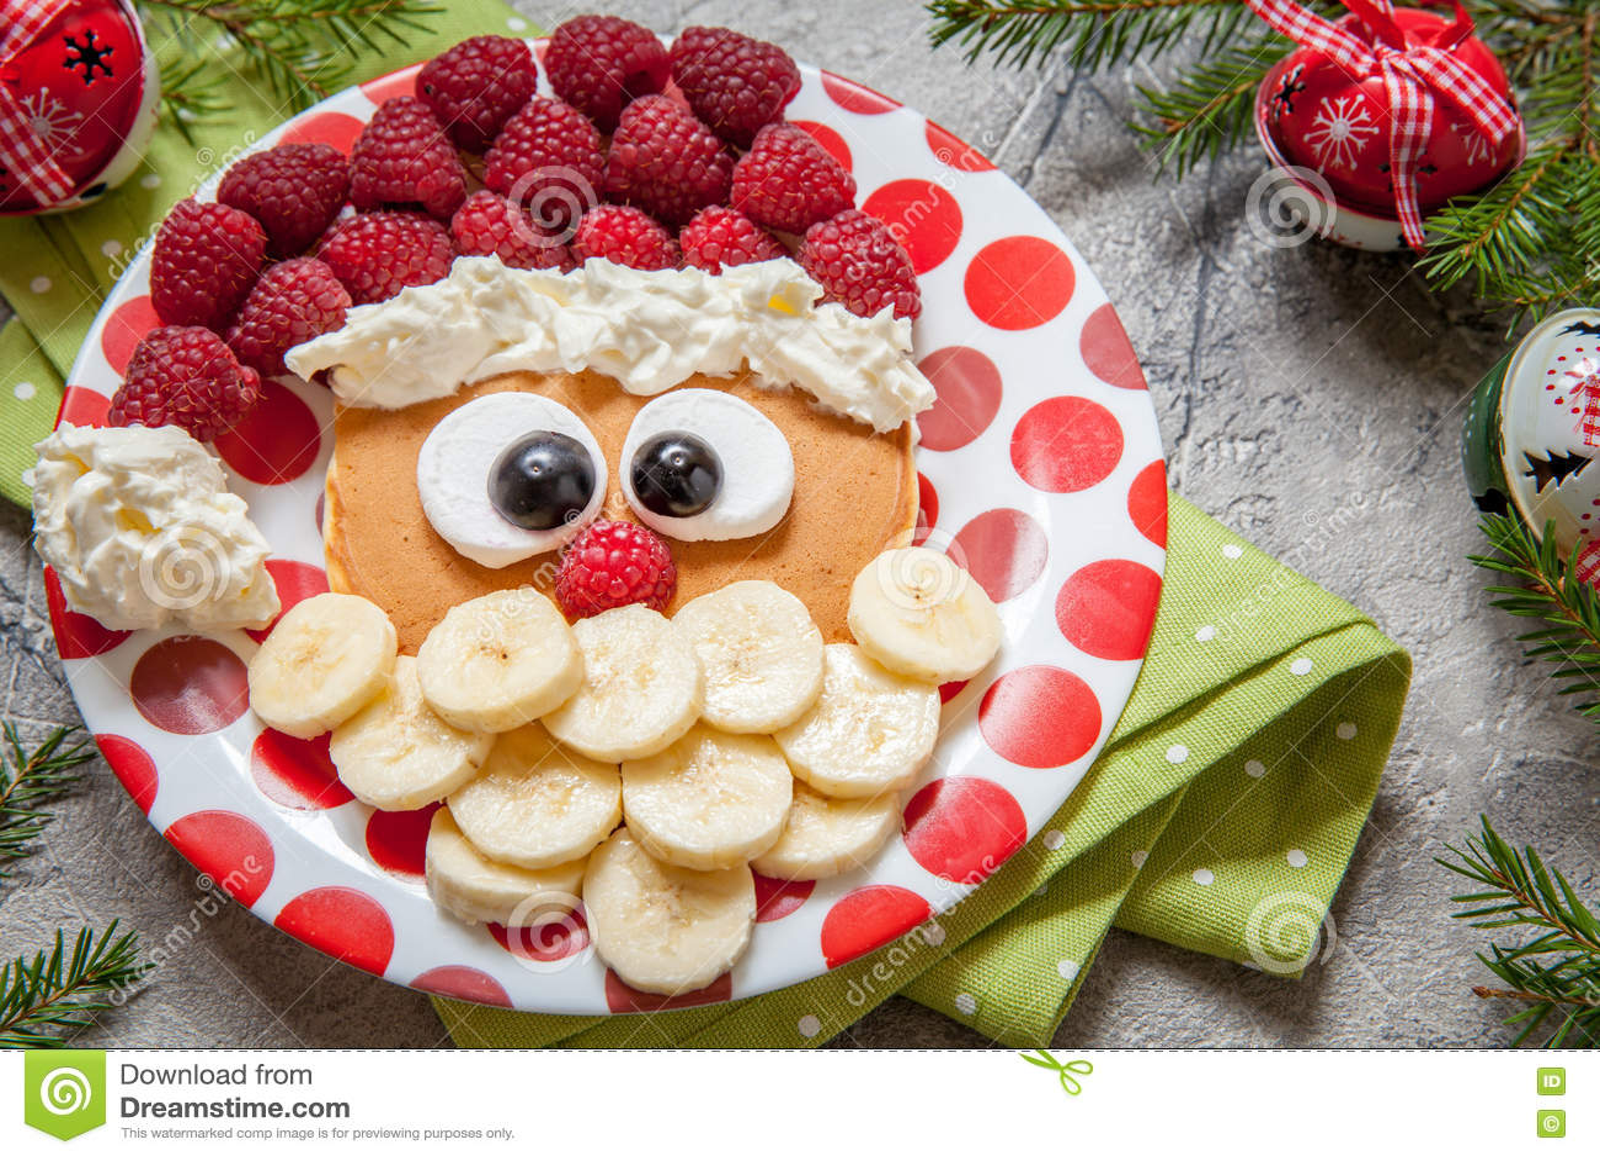 Santa Pancake With Raspberry For Kid Breakfast Stock Photo - Image ...